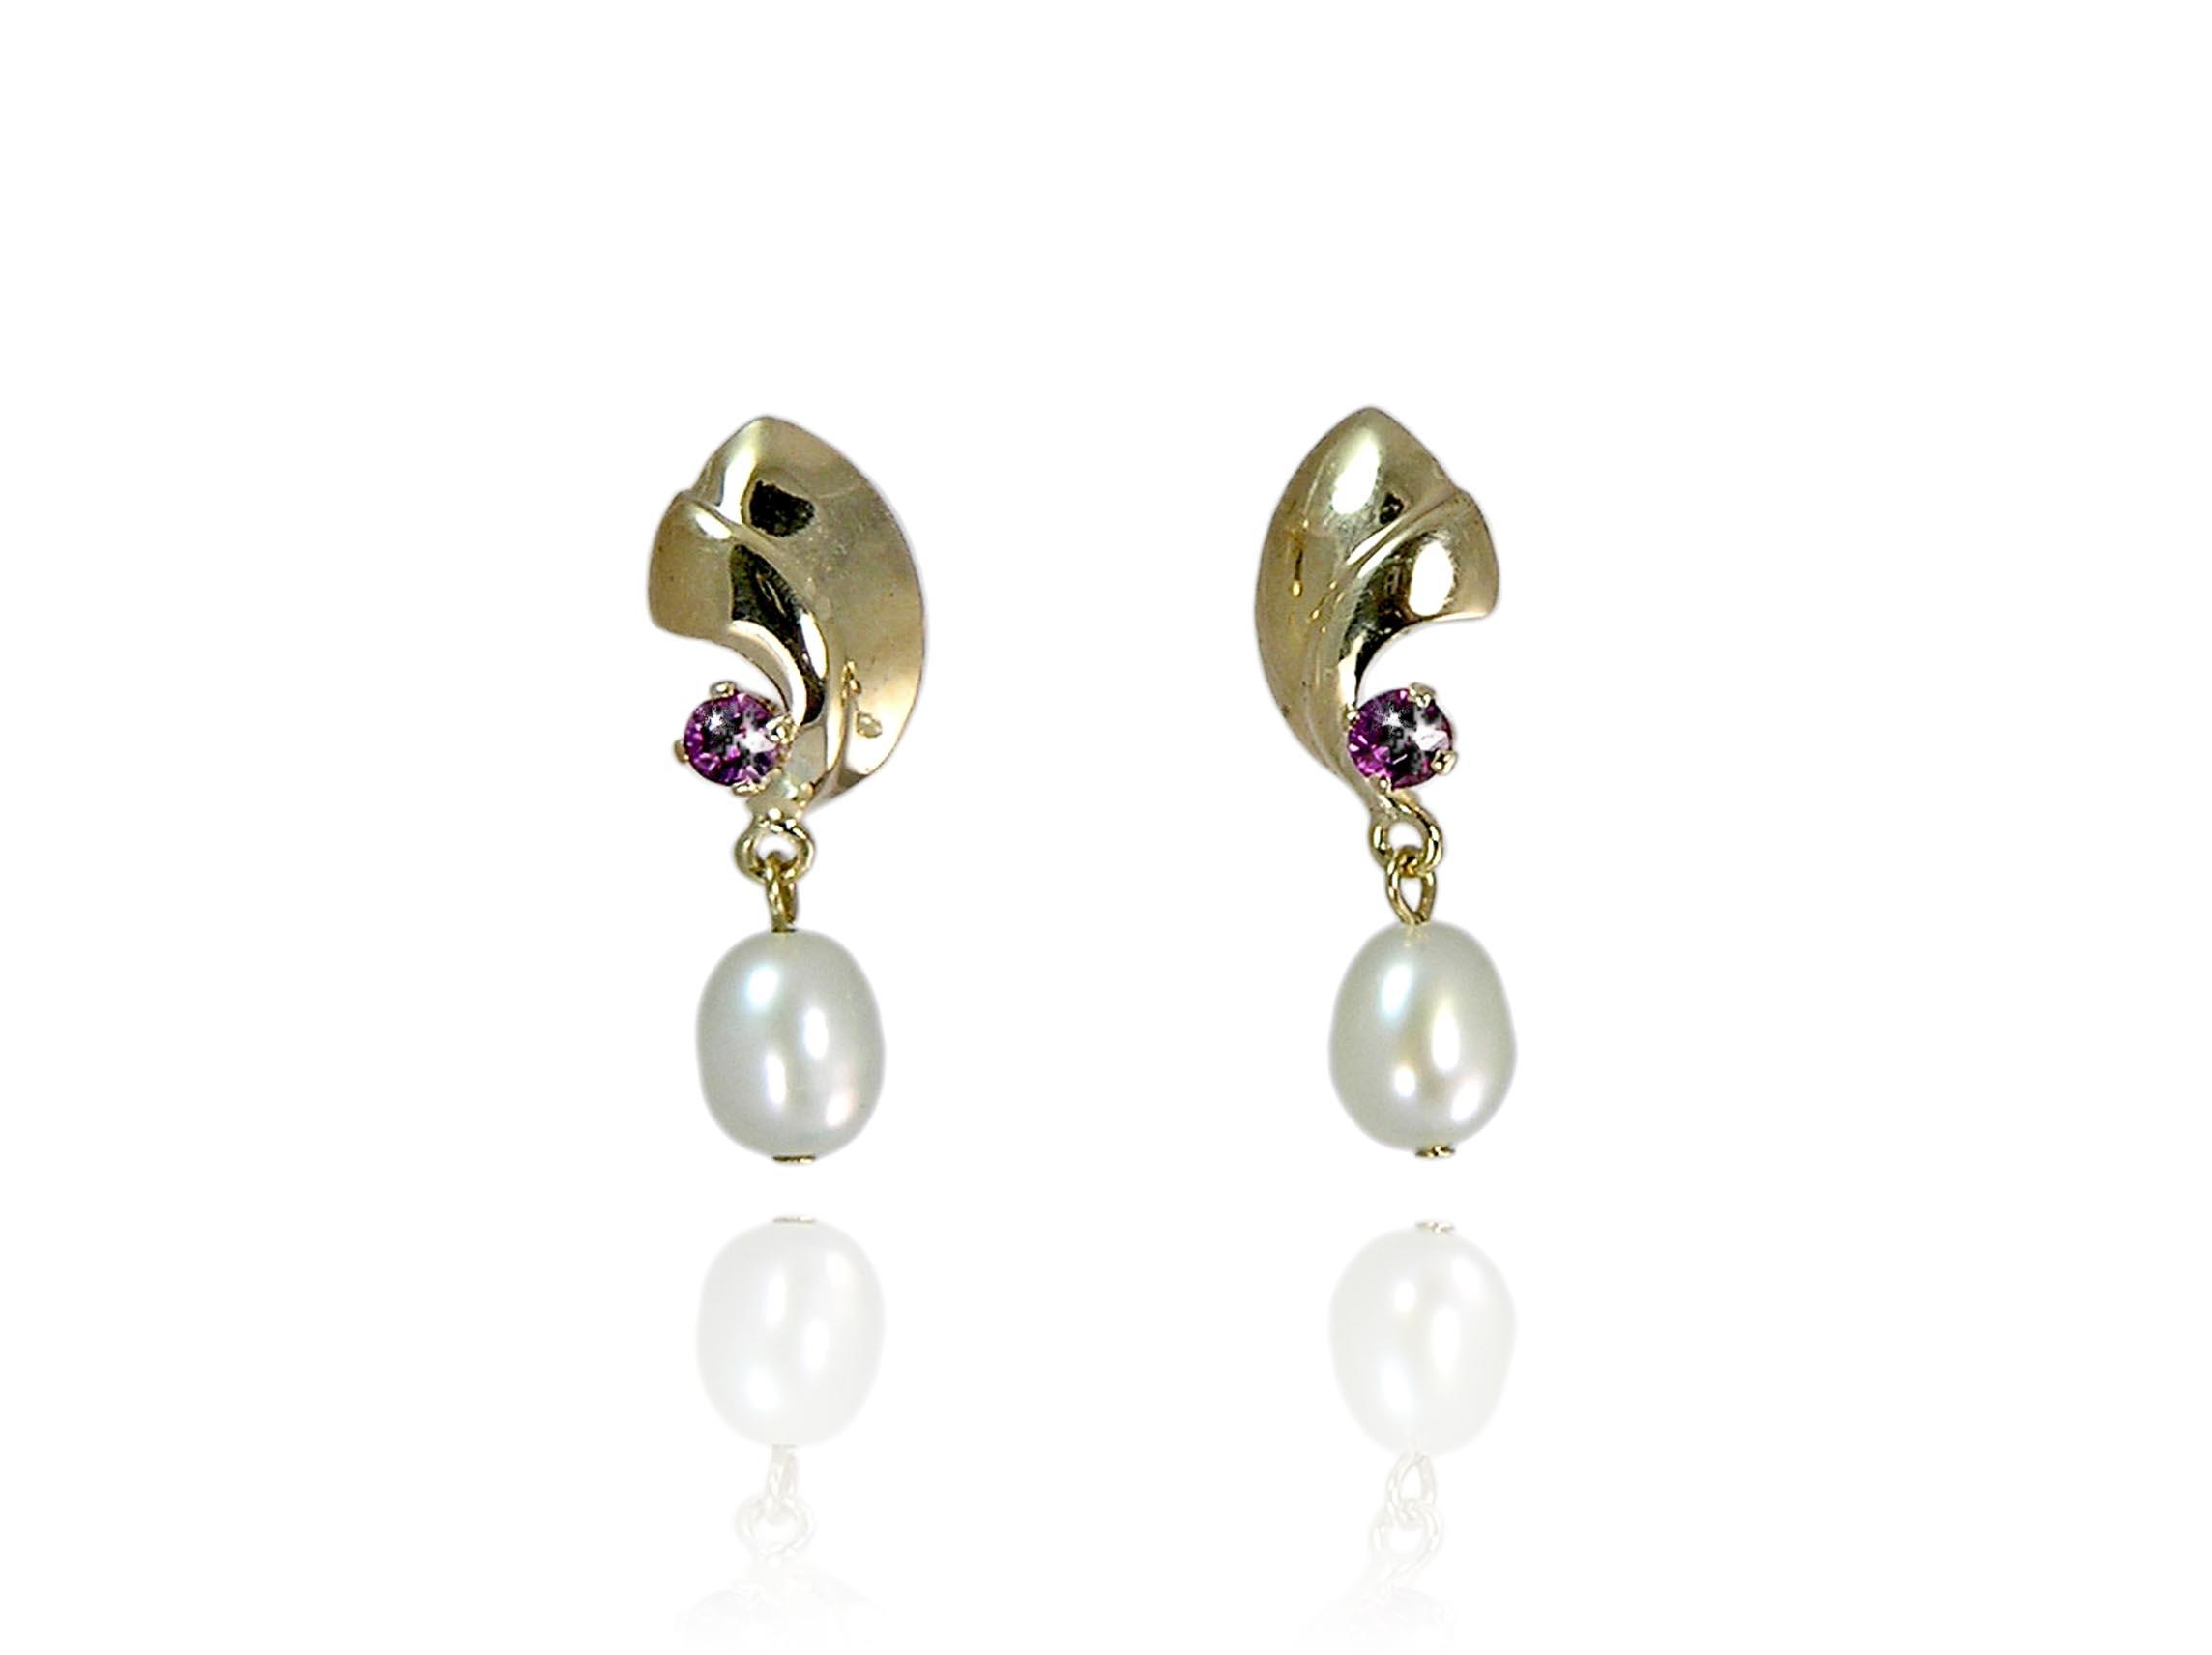 White Freshwater Pearl Earrings with Garnet